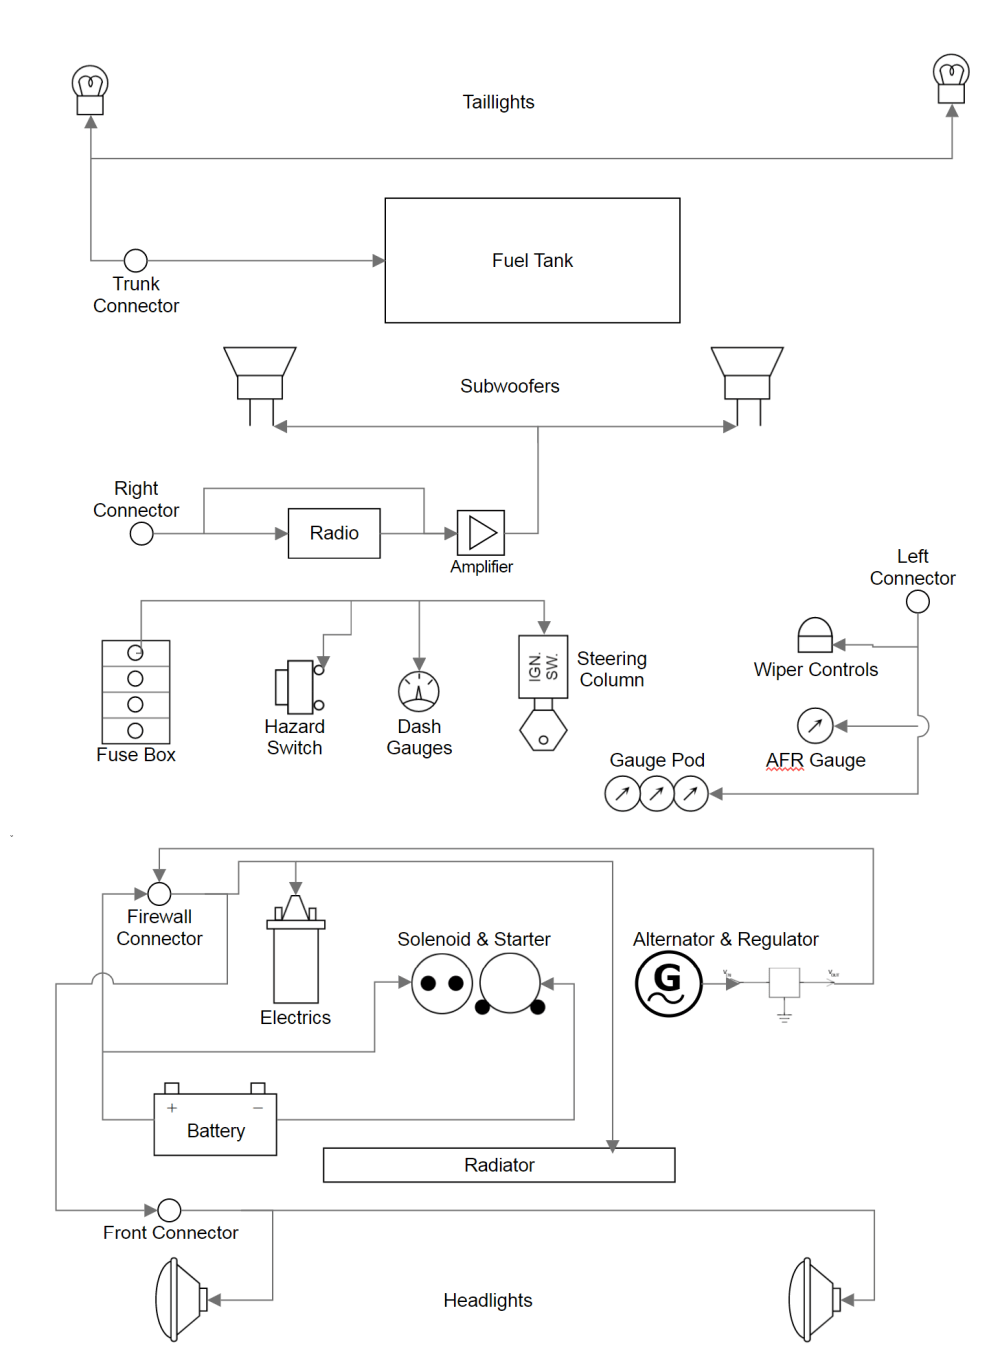 medium resolution of omg wiring diagram wiring diagram expertomg wiring diagram wiring diagram technic omg wiring diagram